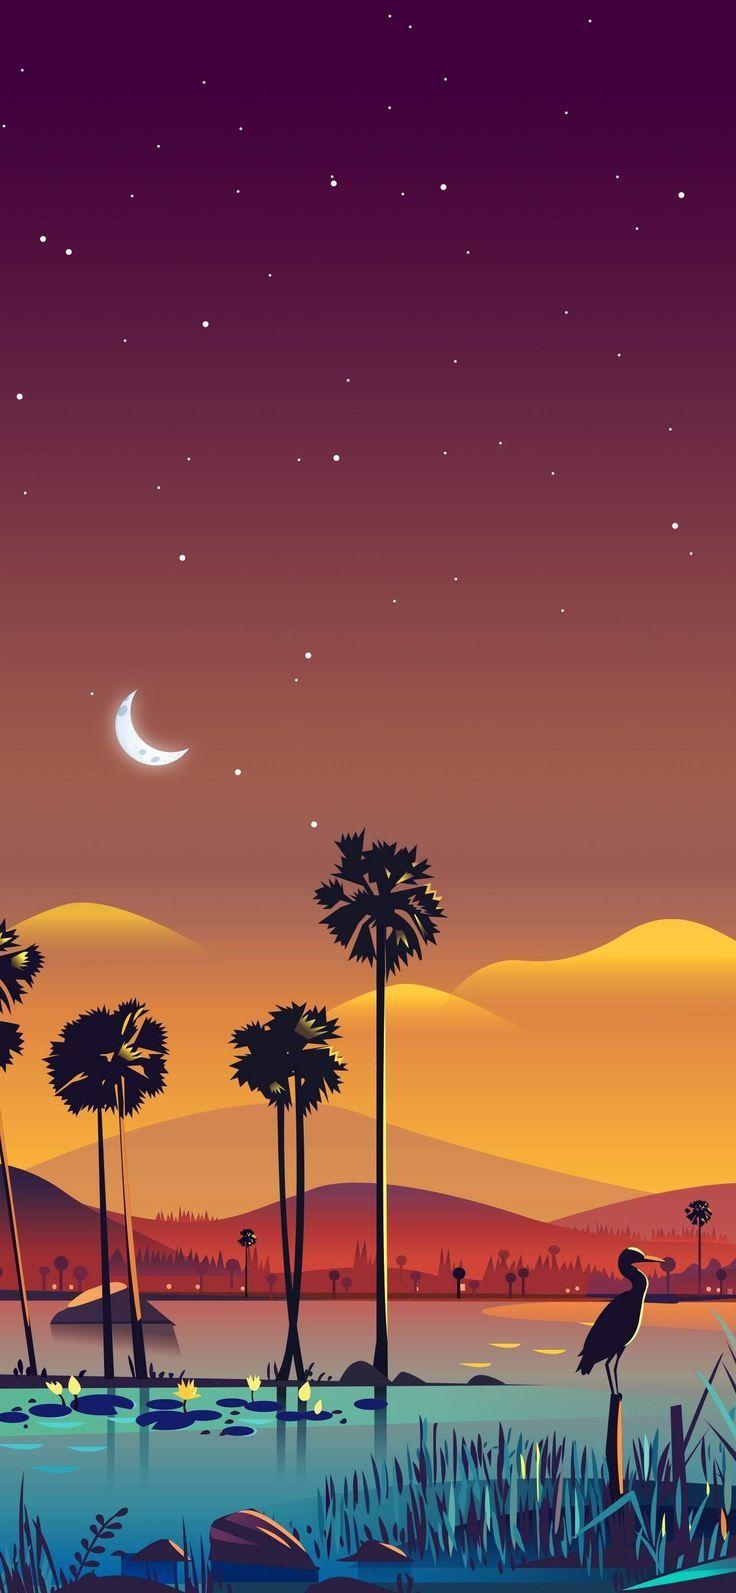 خلفيات من اختياري おしゃれまとめの人気アイデア Pinterest E Koi 風景の壁紙 木の壁紙 風景